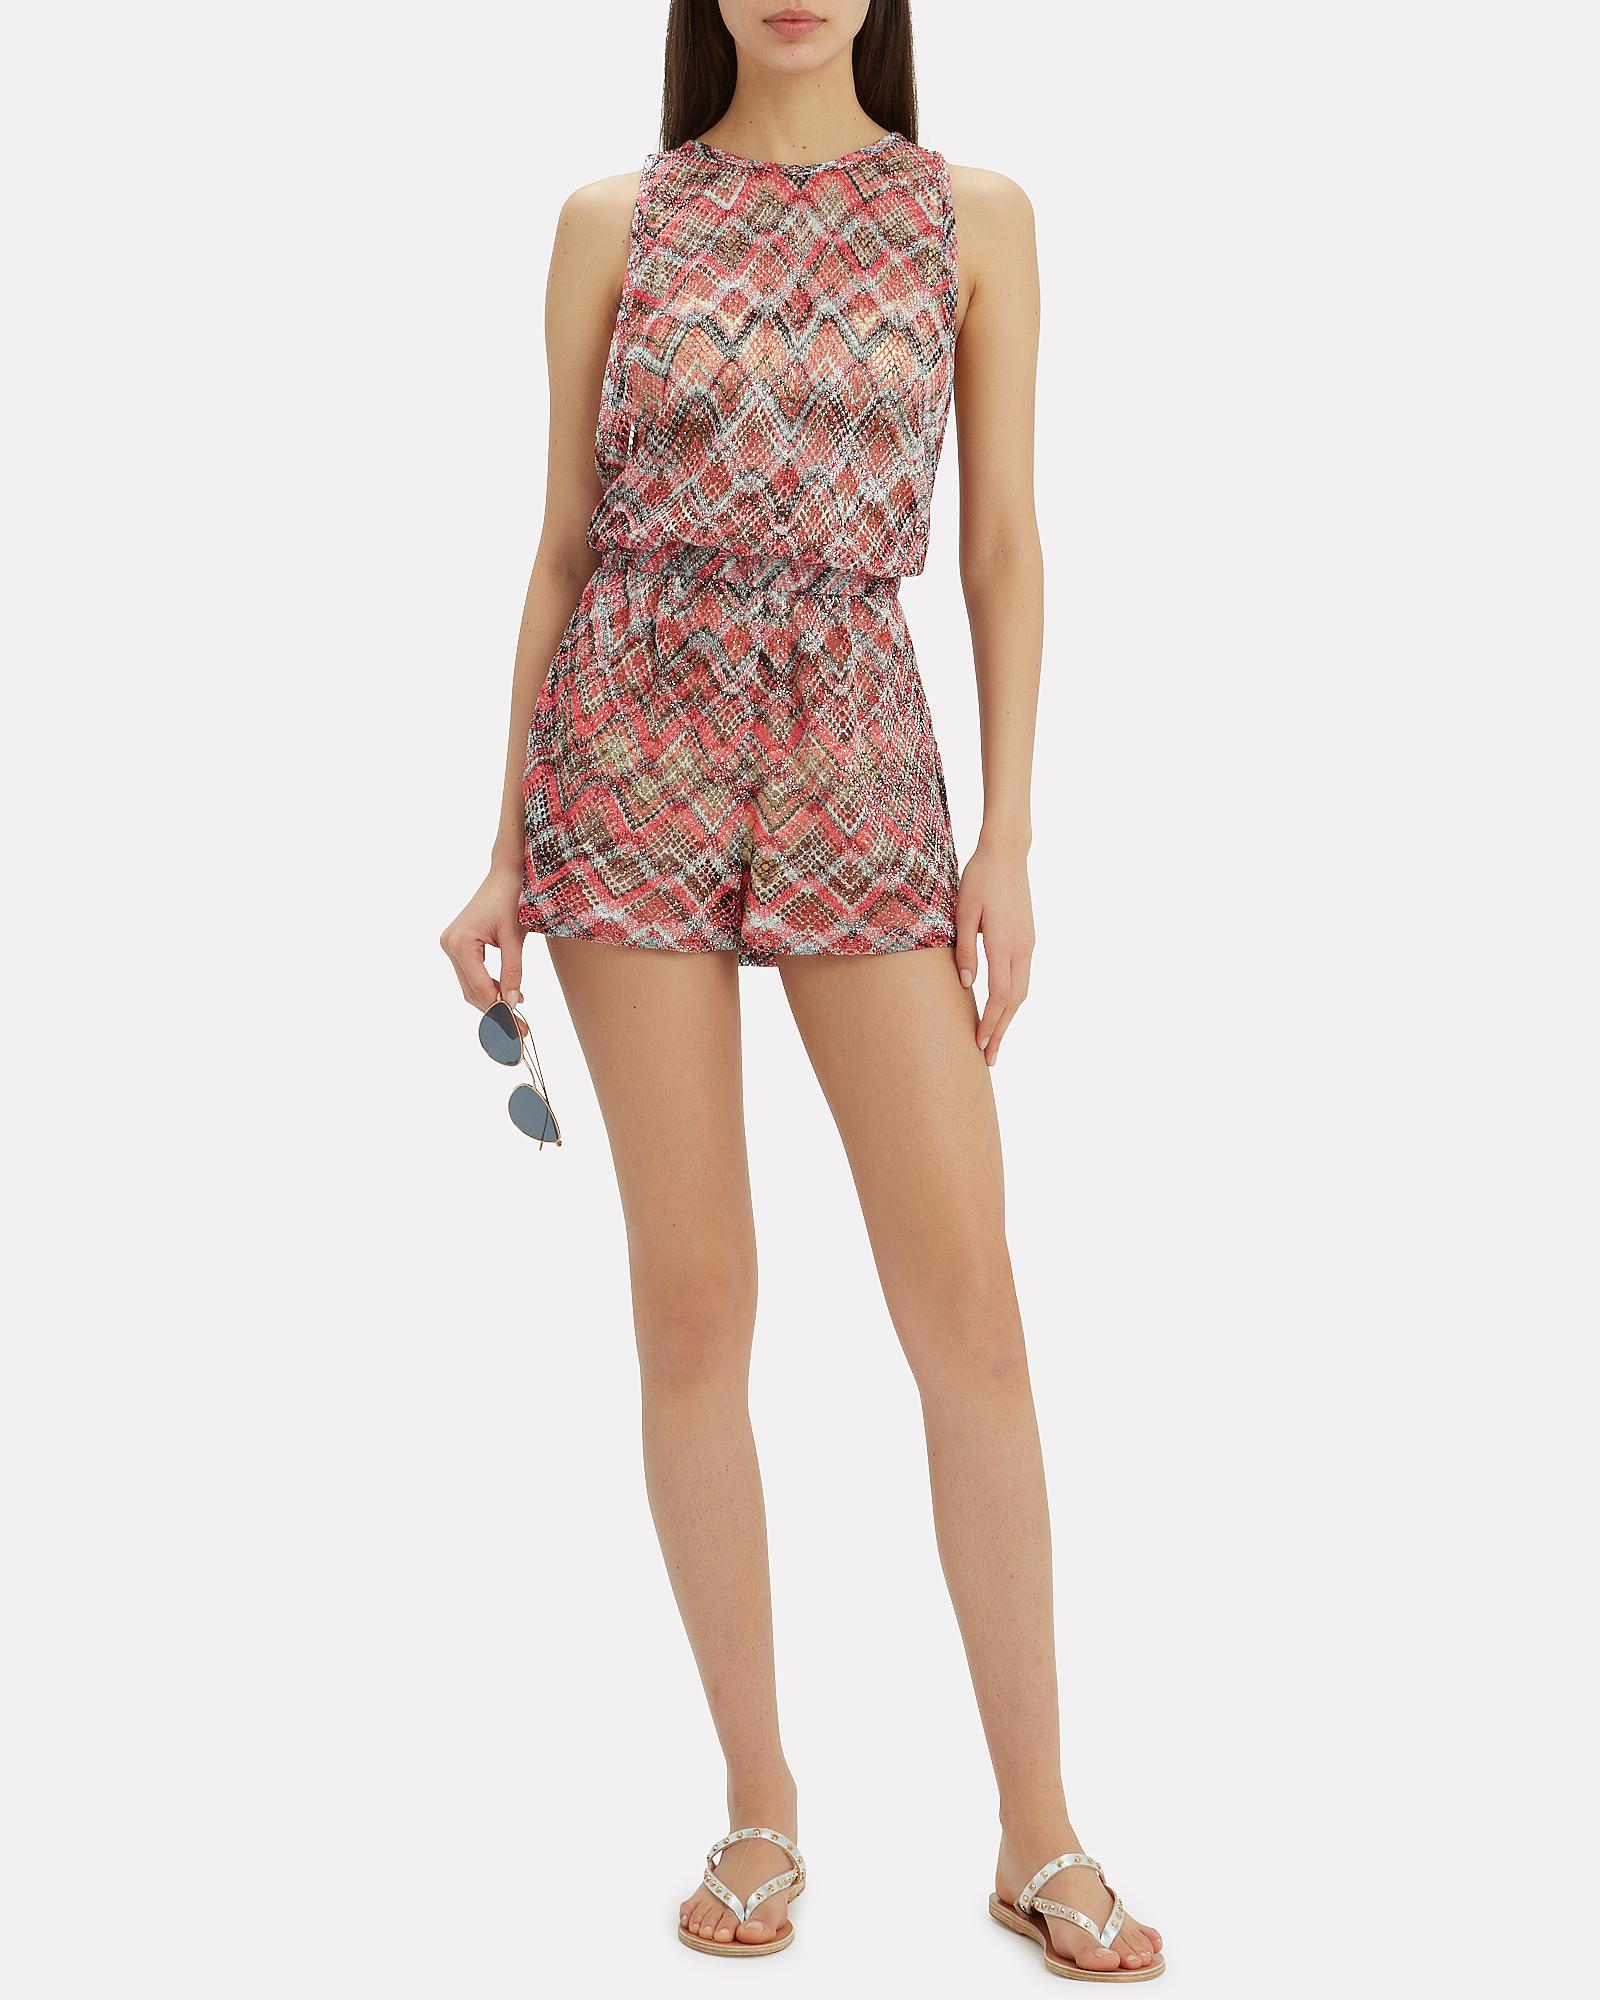 b2726851417 Lyst - Missoni Chevron Knit Beach Playsuit in Red